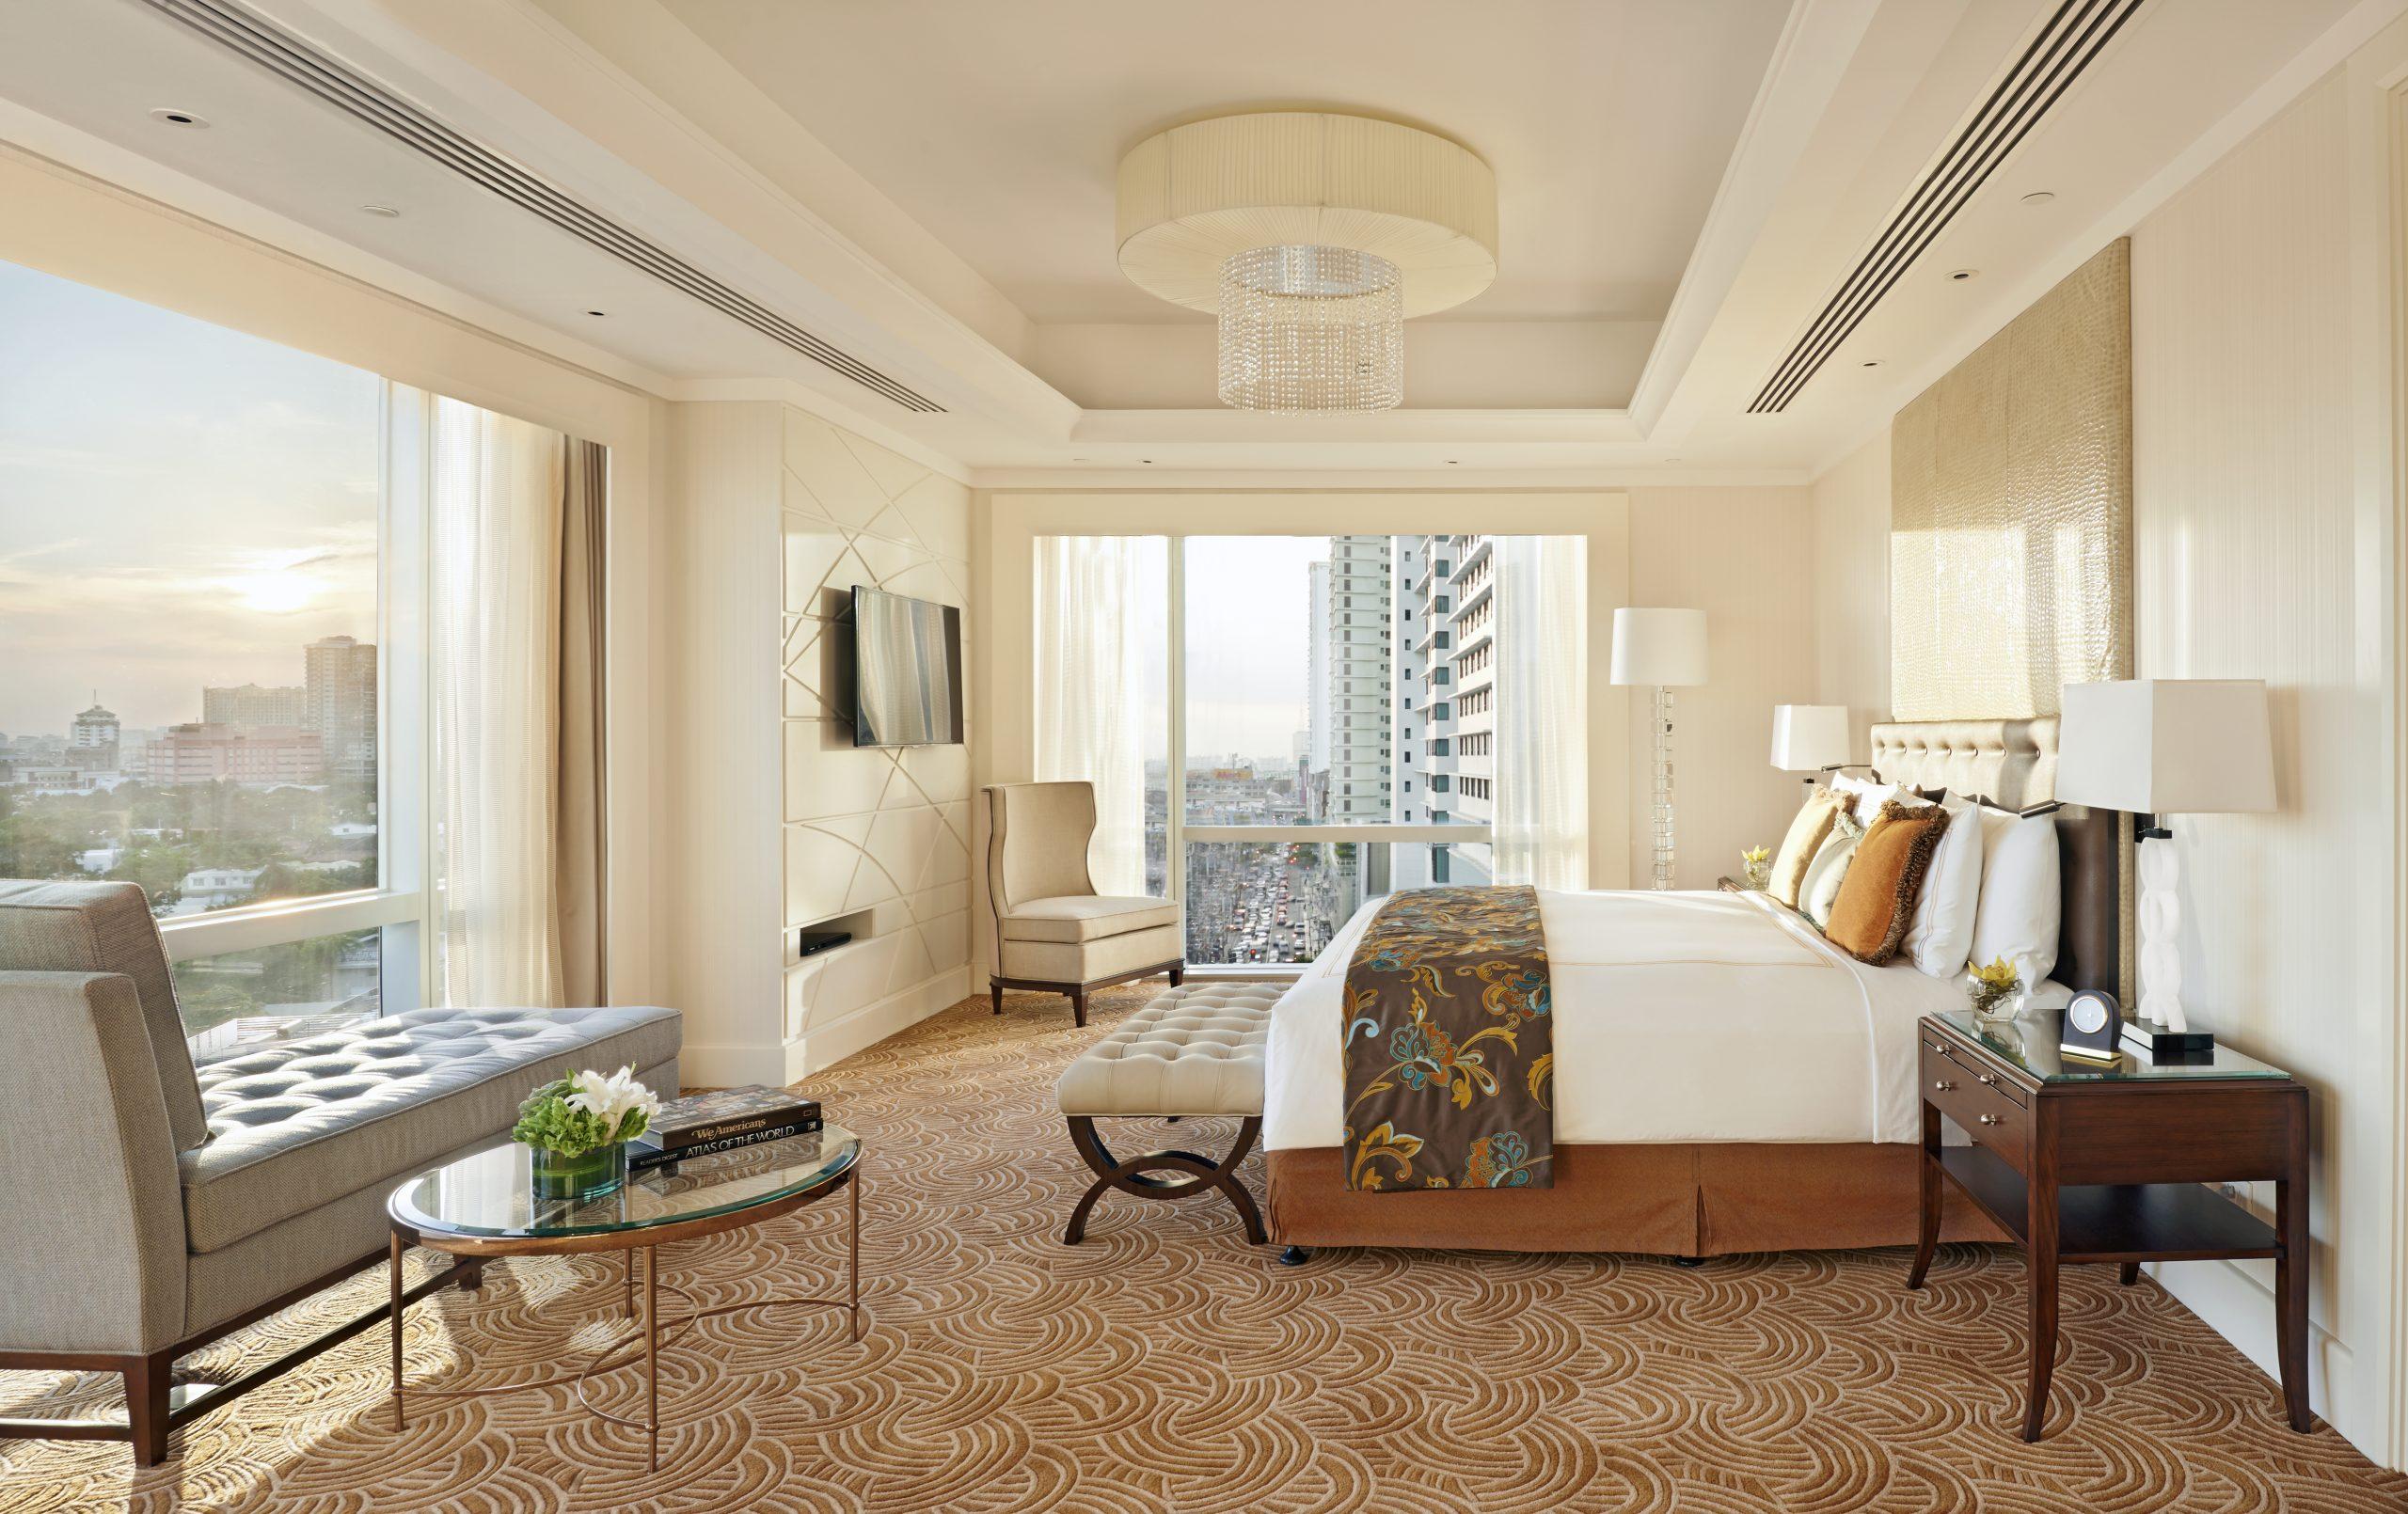 https://www.ayalaland.com.ph/app/uploads/2021/09/Fairmont-Presidential-Suite-Bedroom-scaled.jpg